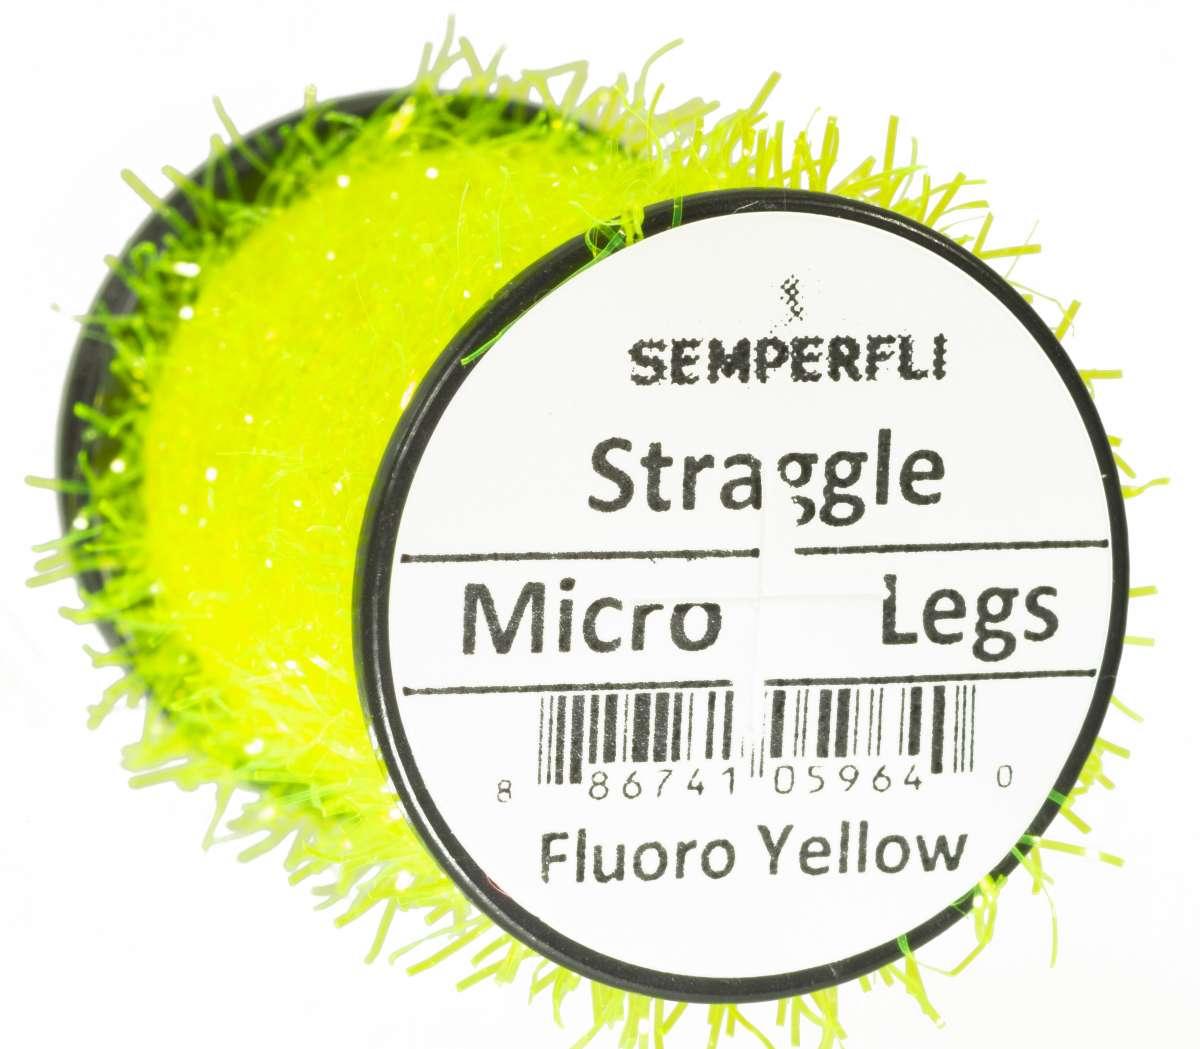 Straggle Legs Sem-0200-fy